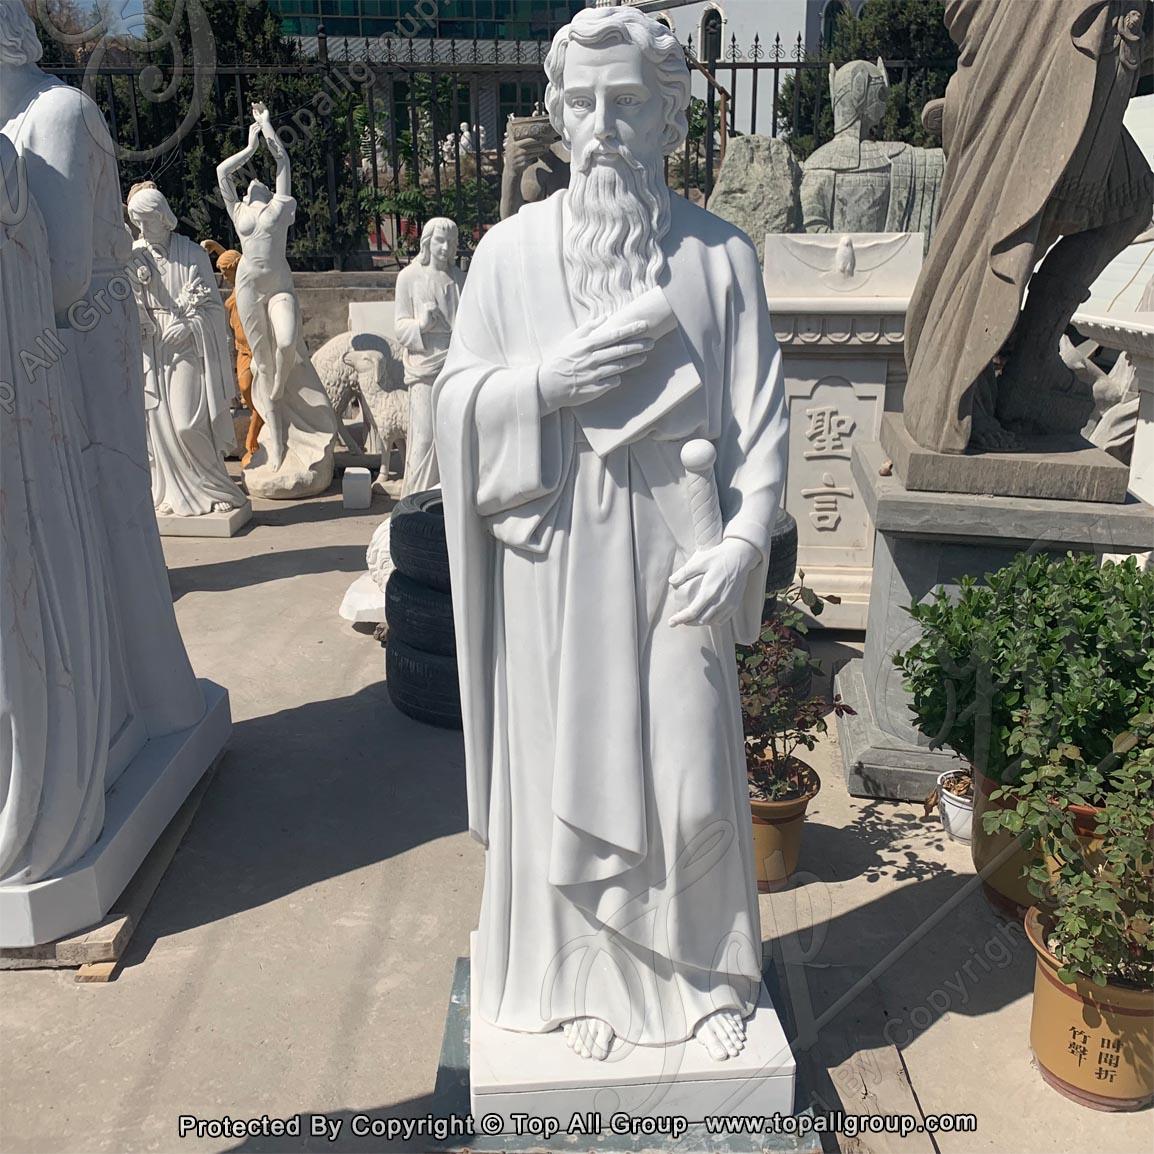 Religious marble Saint Statues